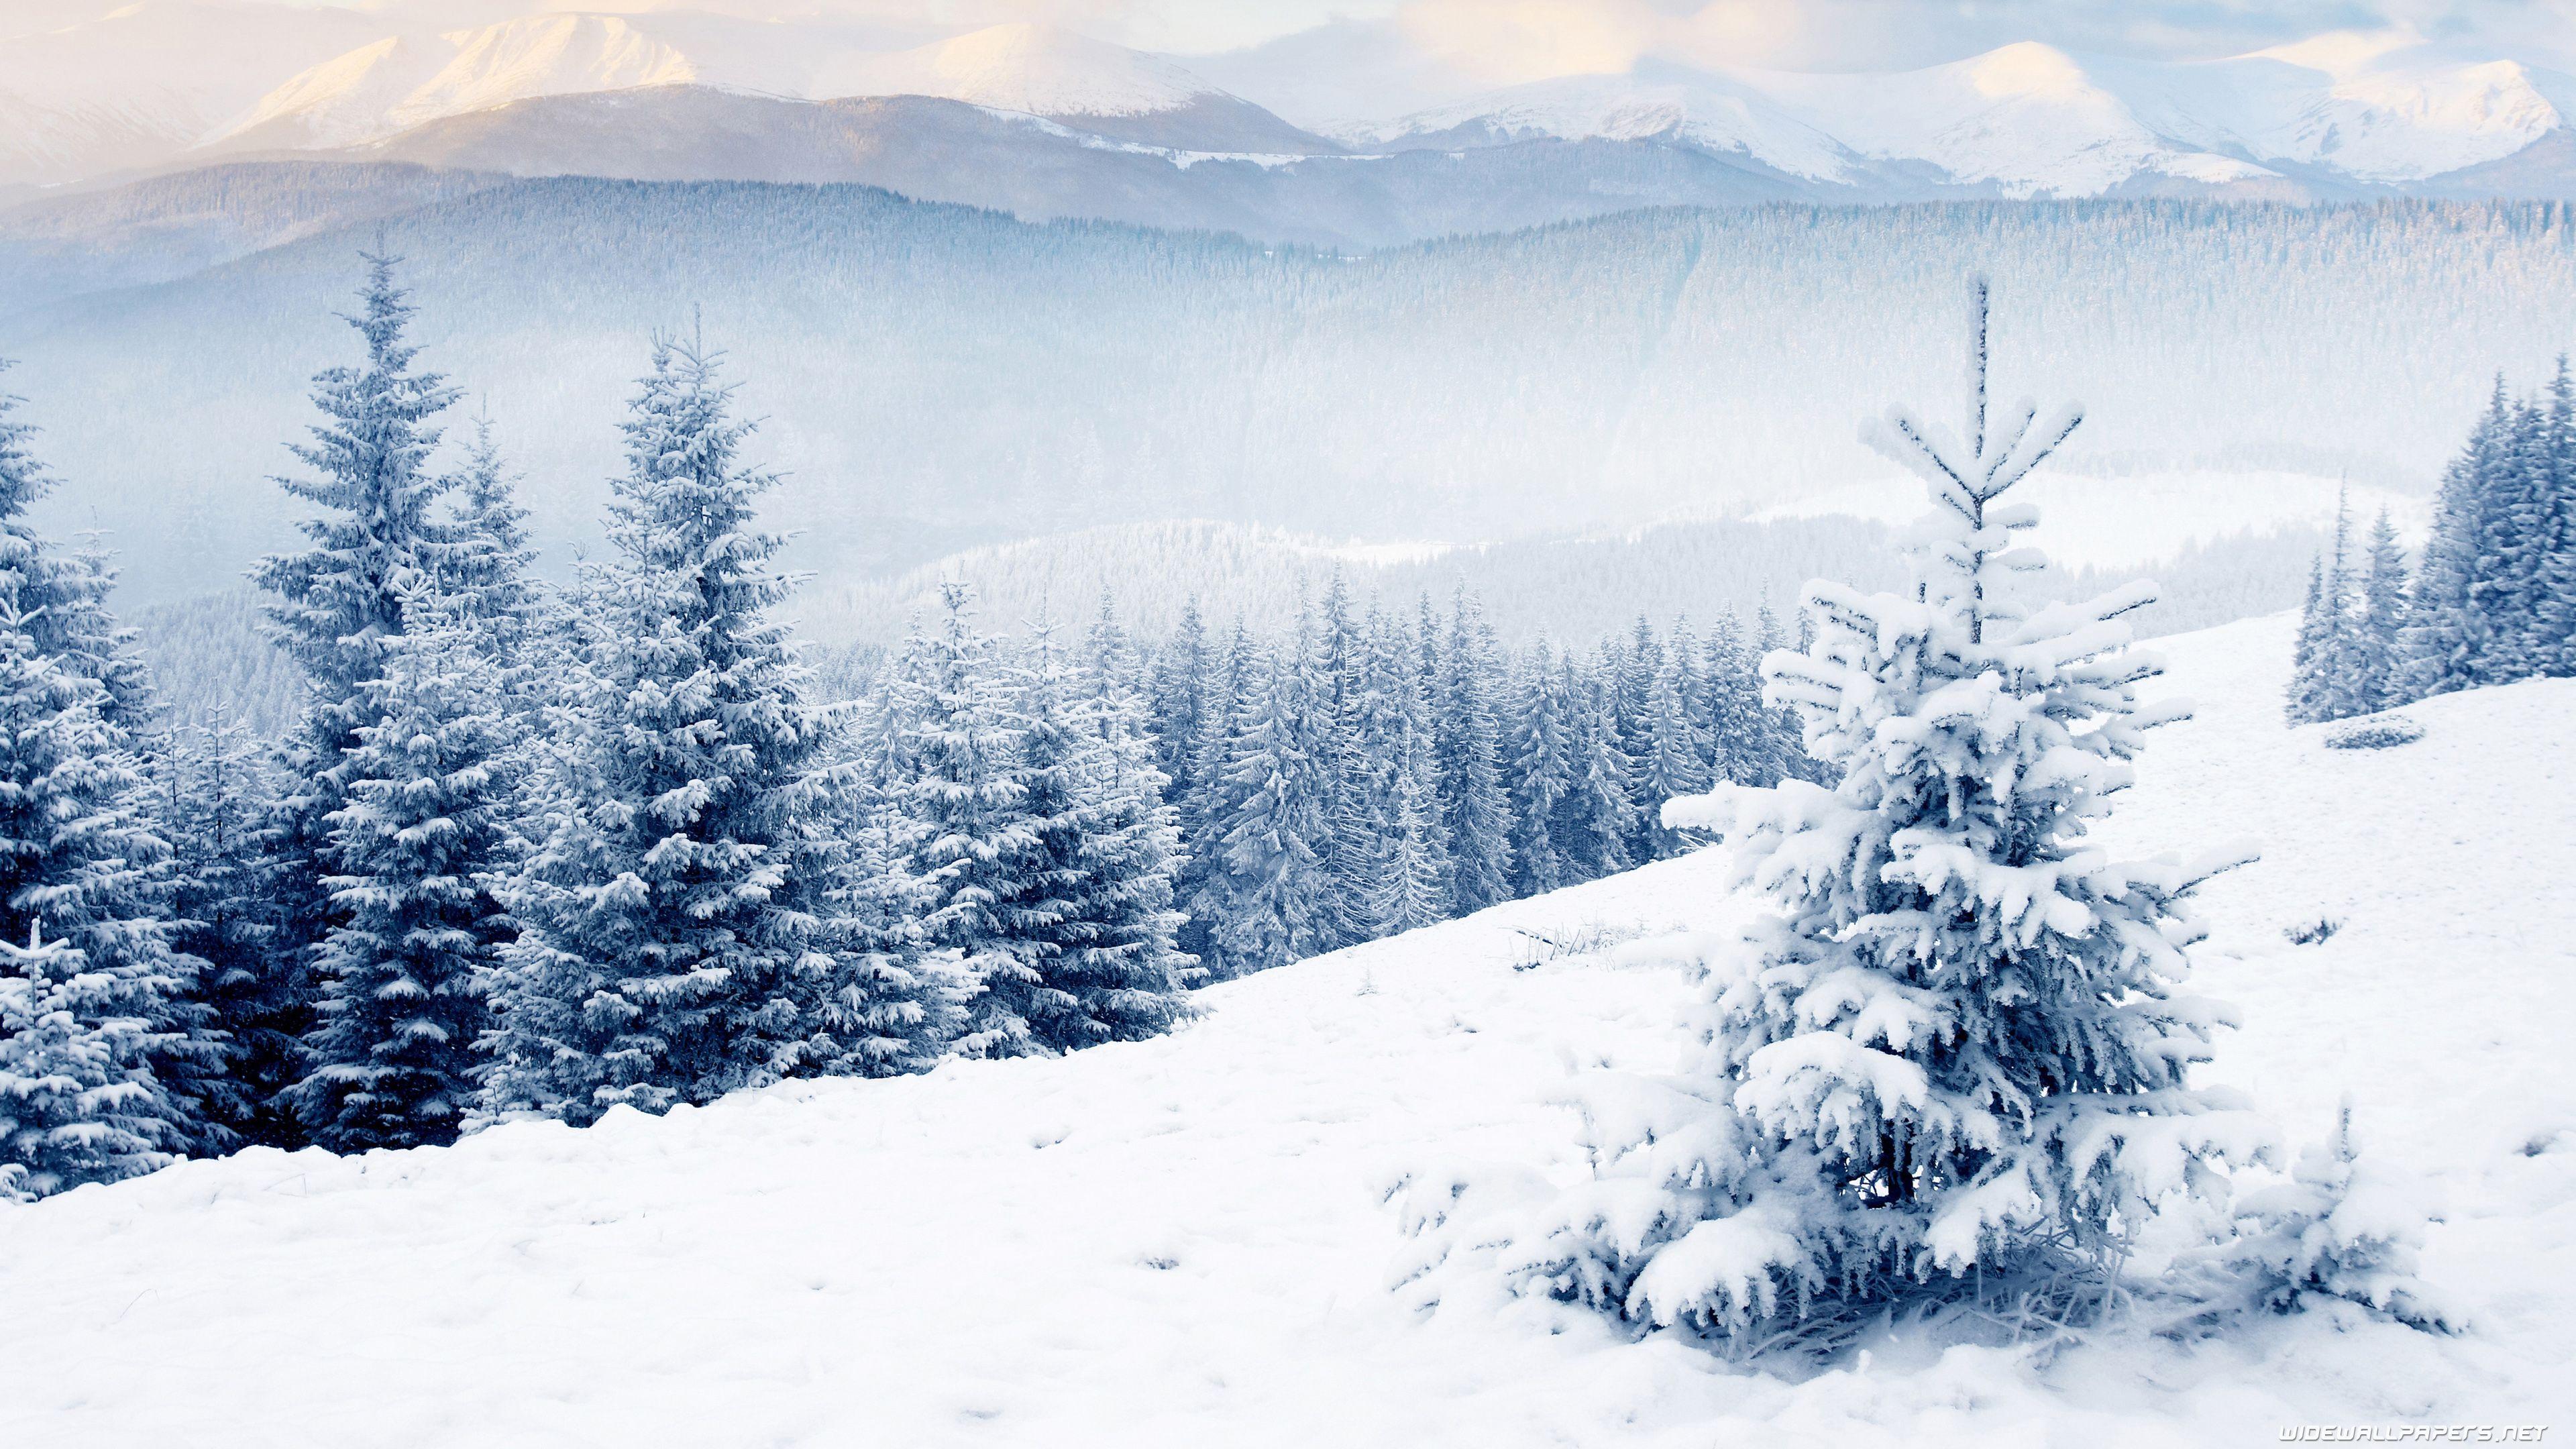 Winter Wallpapers Hd   Winter Desktop Wallpaper 4k 136625 3840x2160